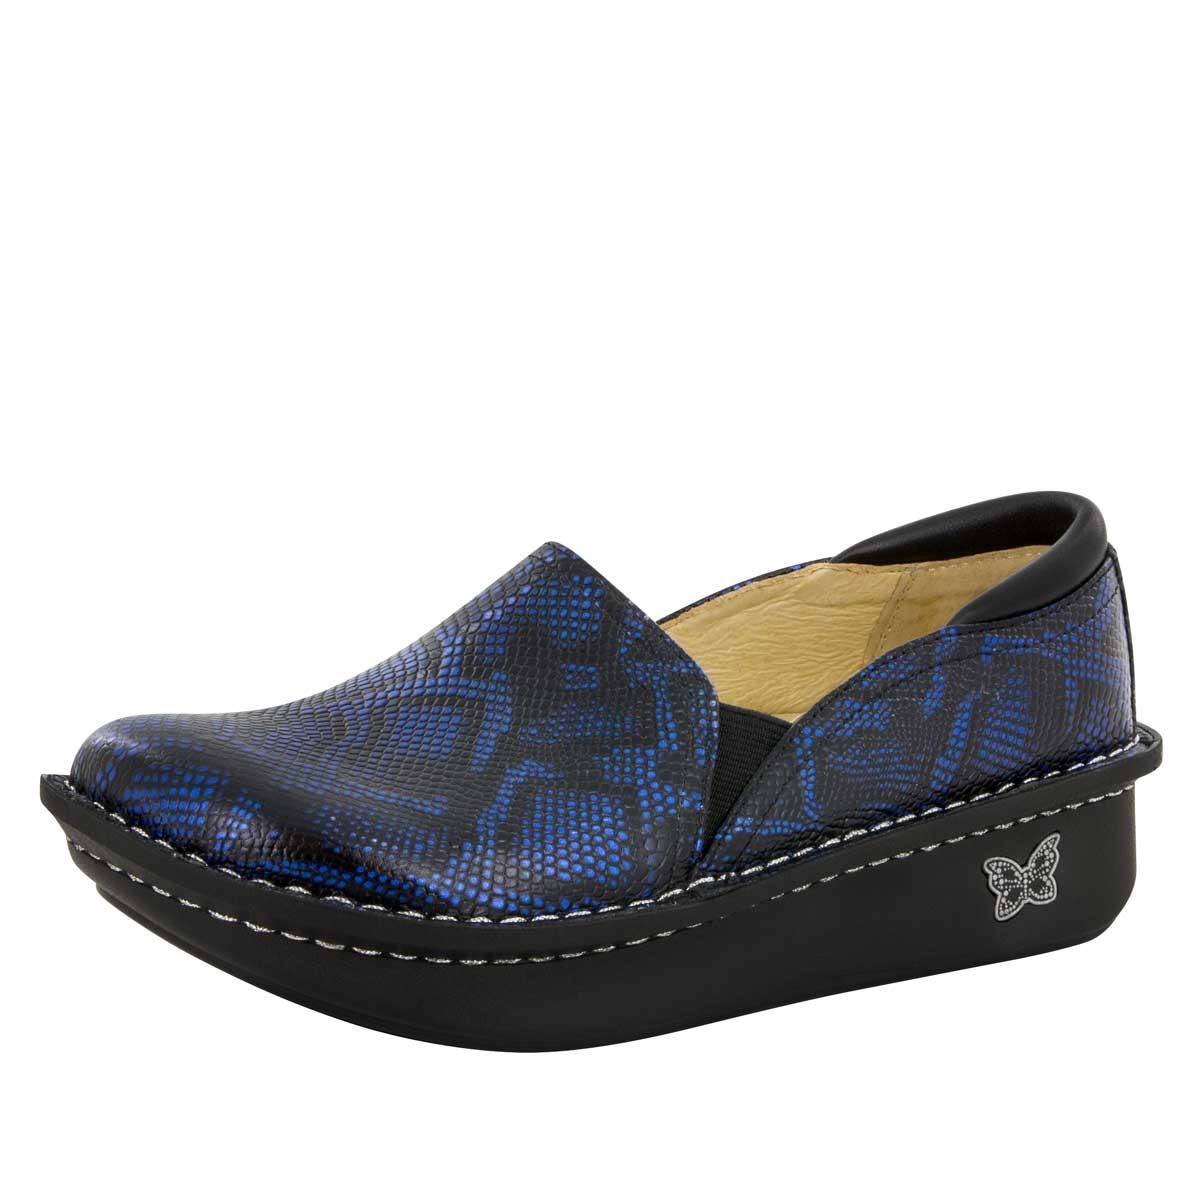 Best Shoes For Nursing Home